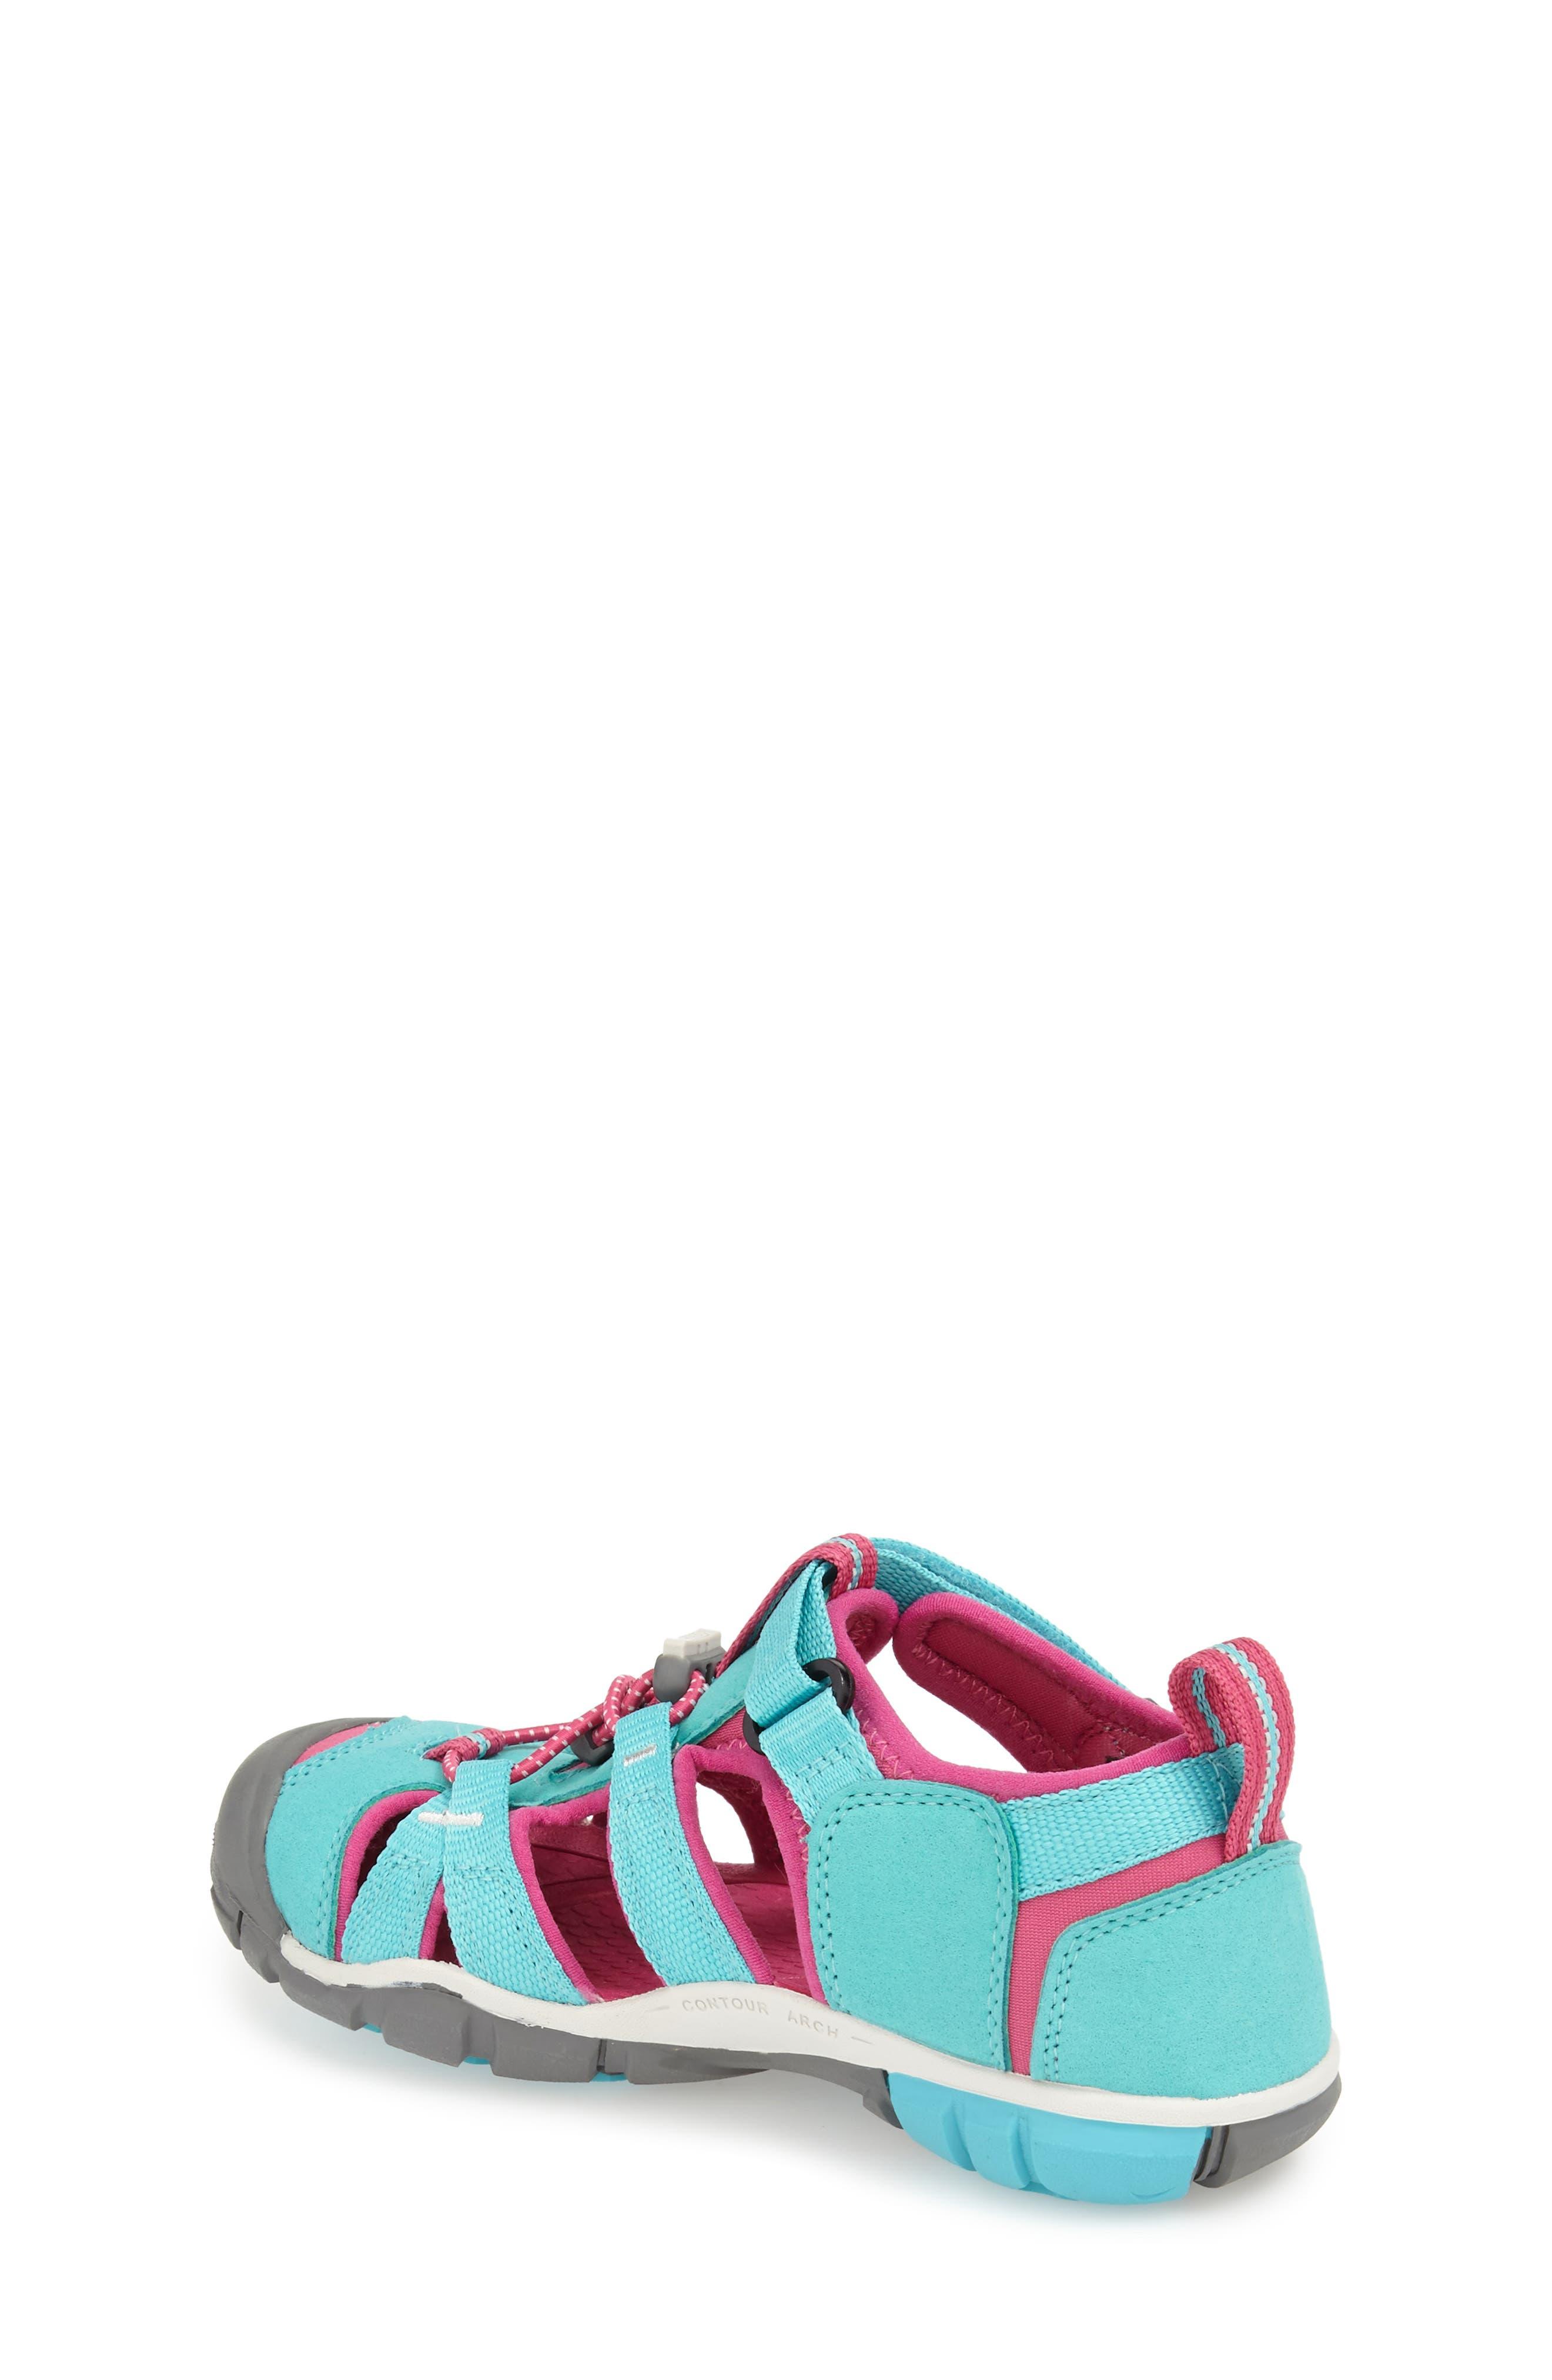 ,                             'Seacamp II' Water Friendly Sandal,                             Alternate thumbnail 223, color,                             502